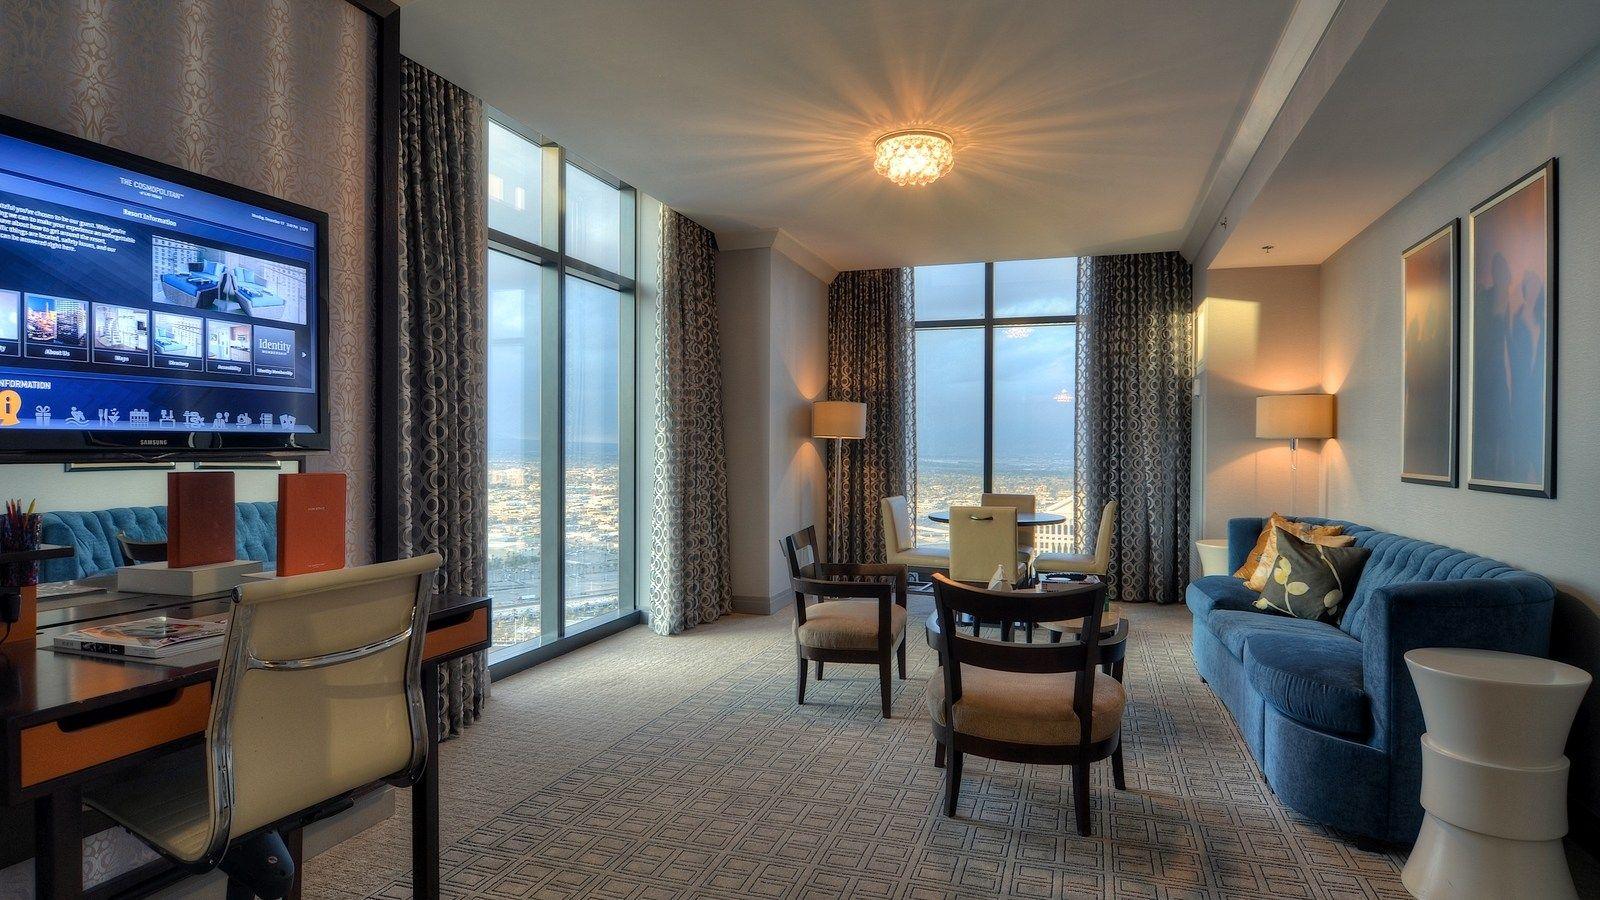 Two Bedroom City Suite The Cosmopolitan Las Vegas One Bedroom With King Bed Second Bedroom With 2 Queens 2 Full City Suites Bedroom Suite 2 Bedroom Suites